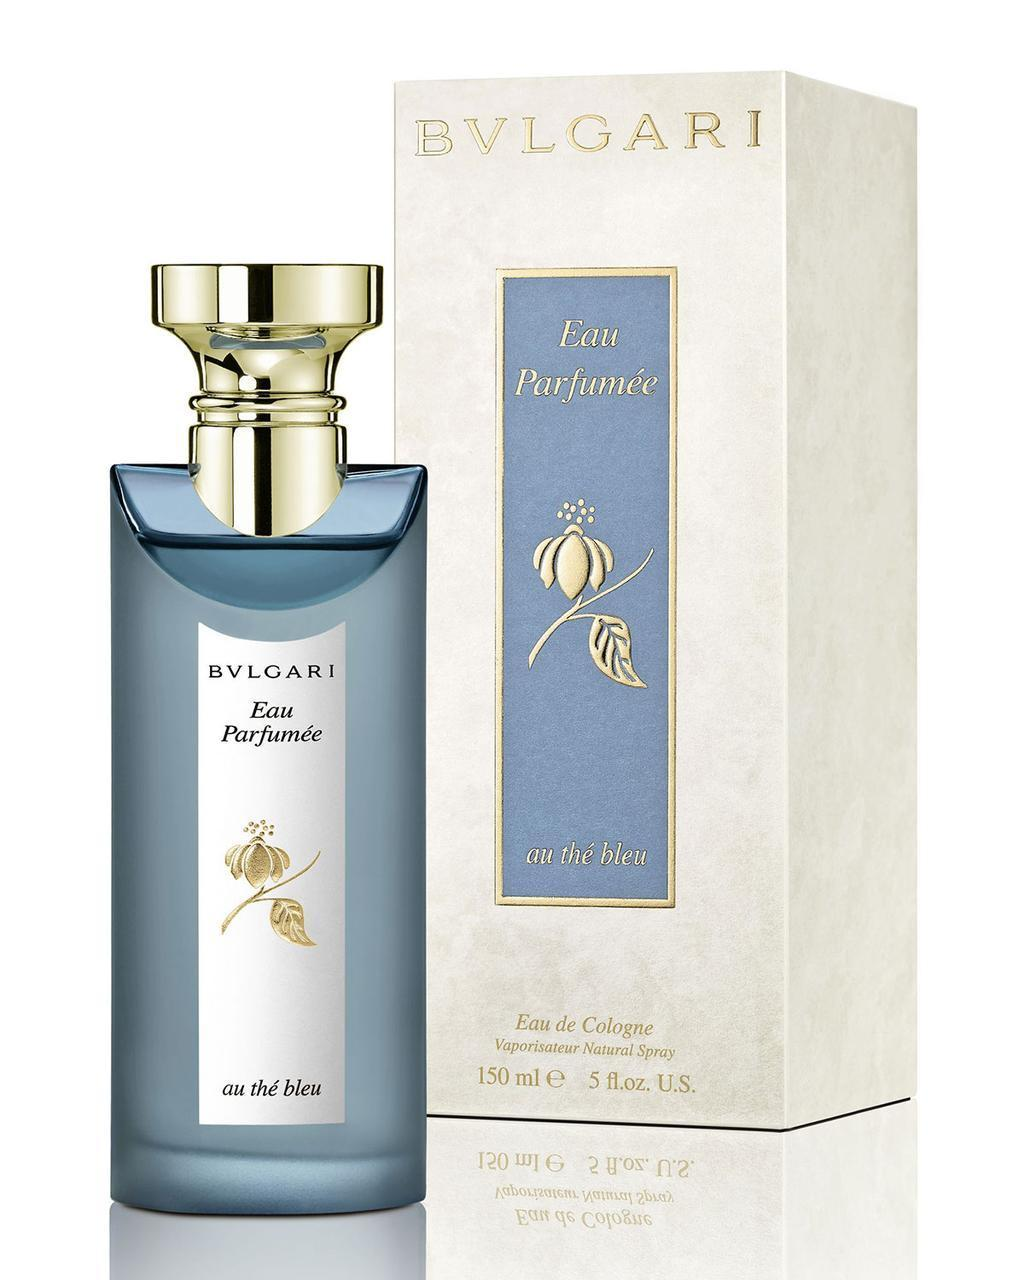 Парфюмерная вода унисекс Bvlgari Eau Parfumee Au The Bleu, 150 мл